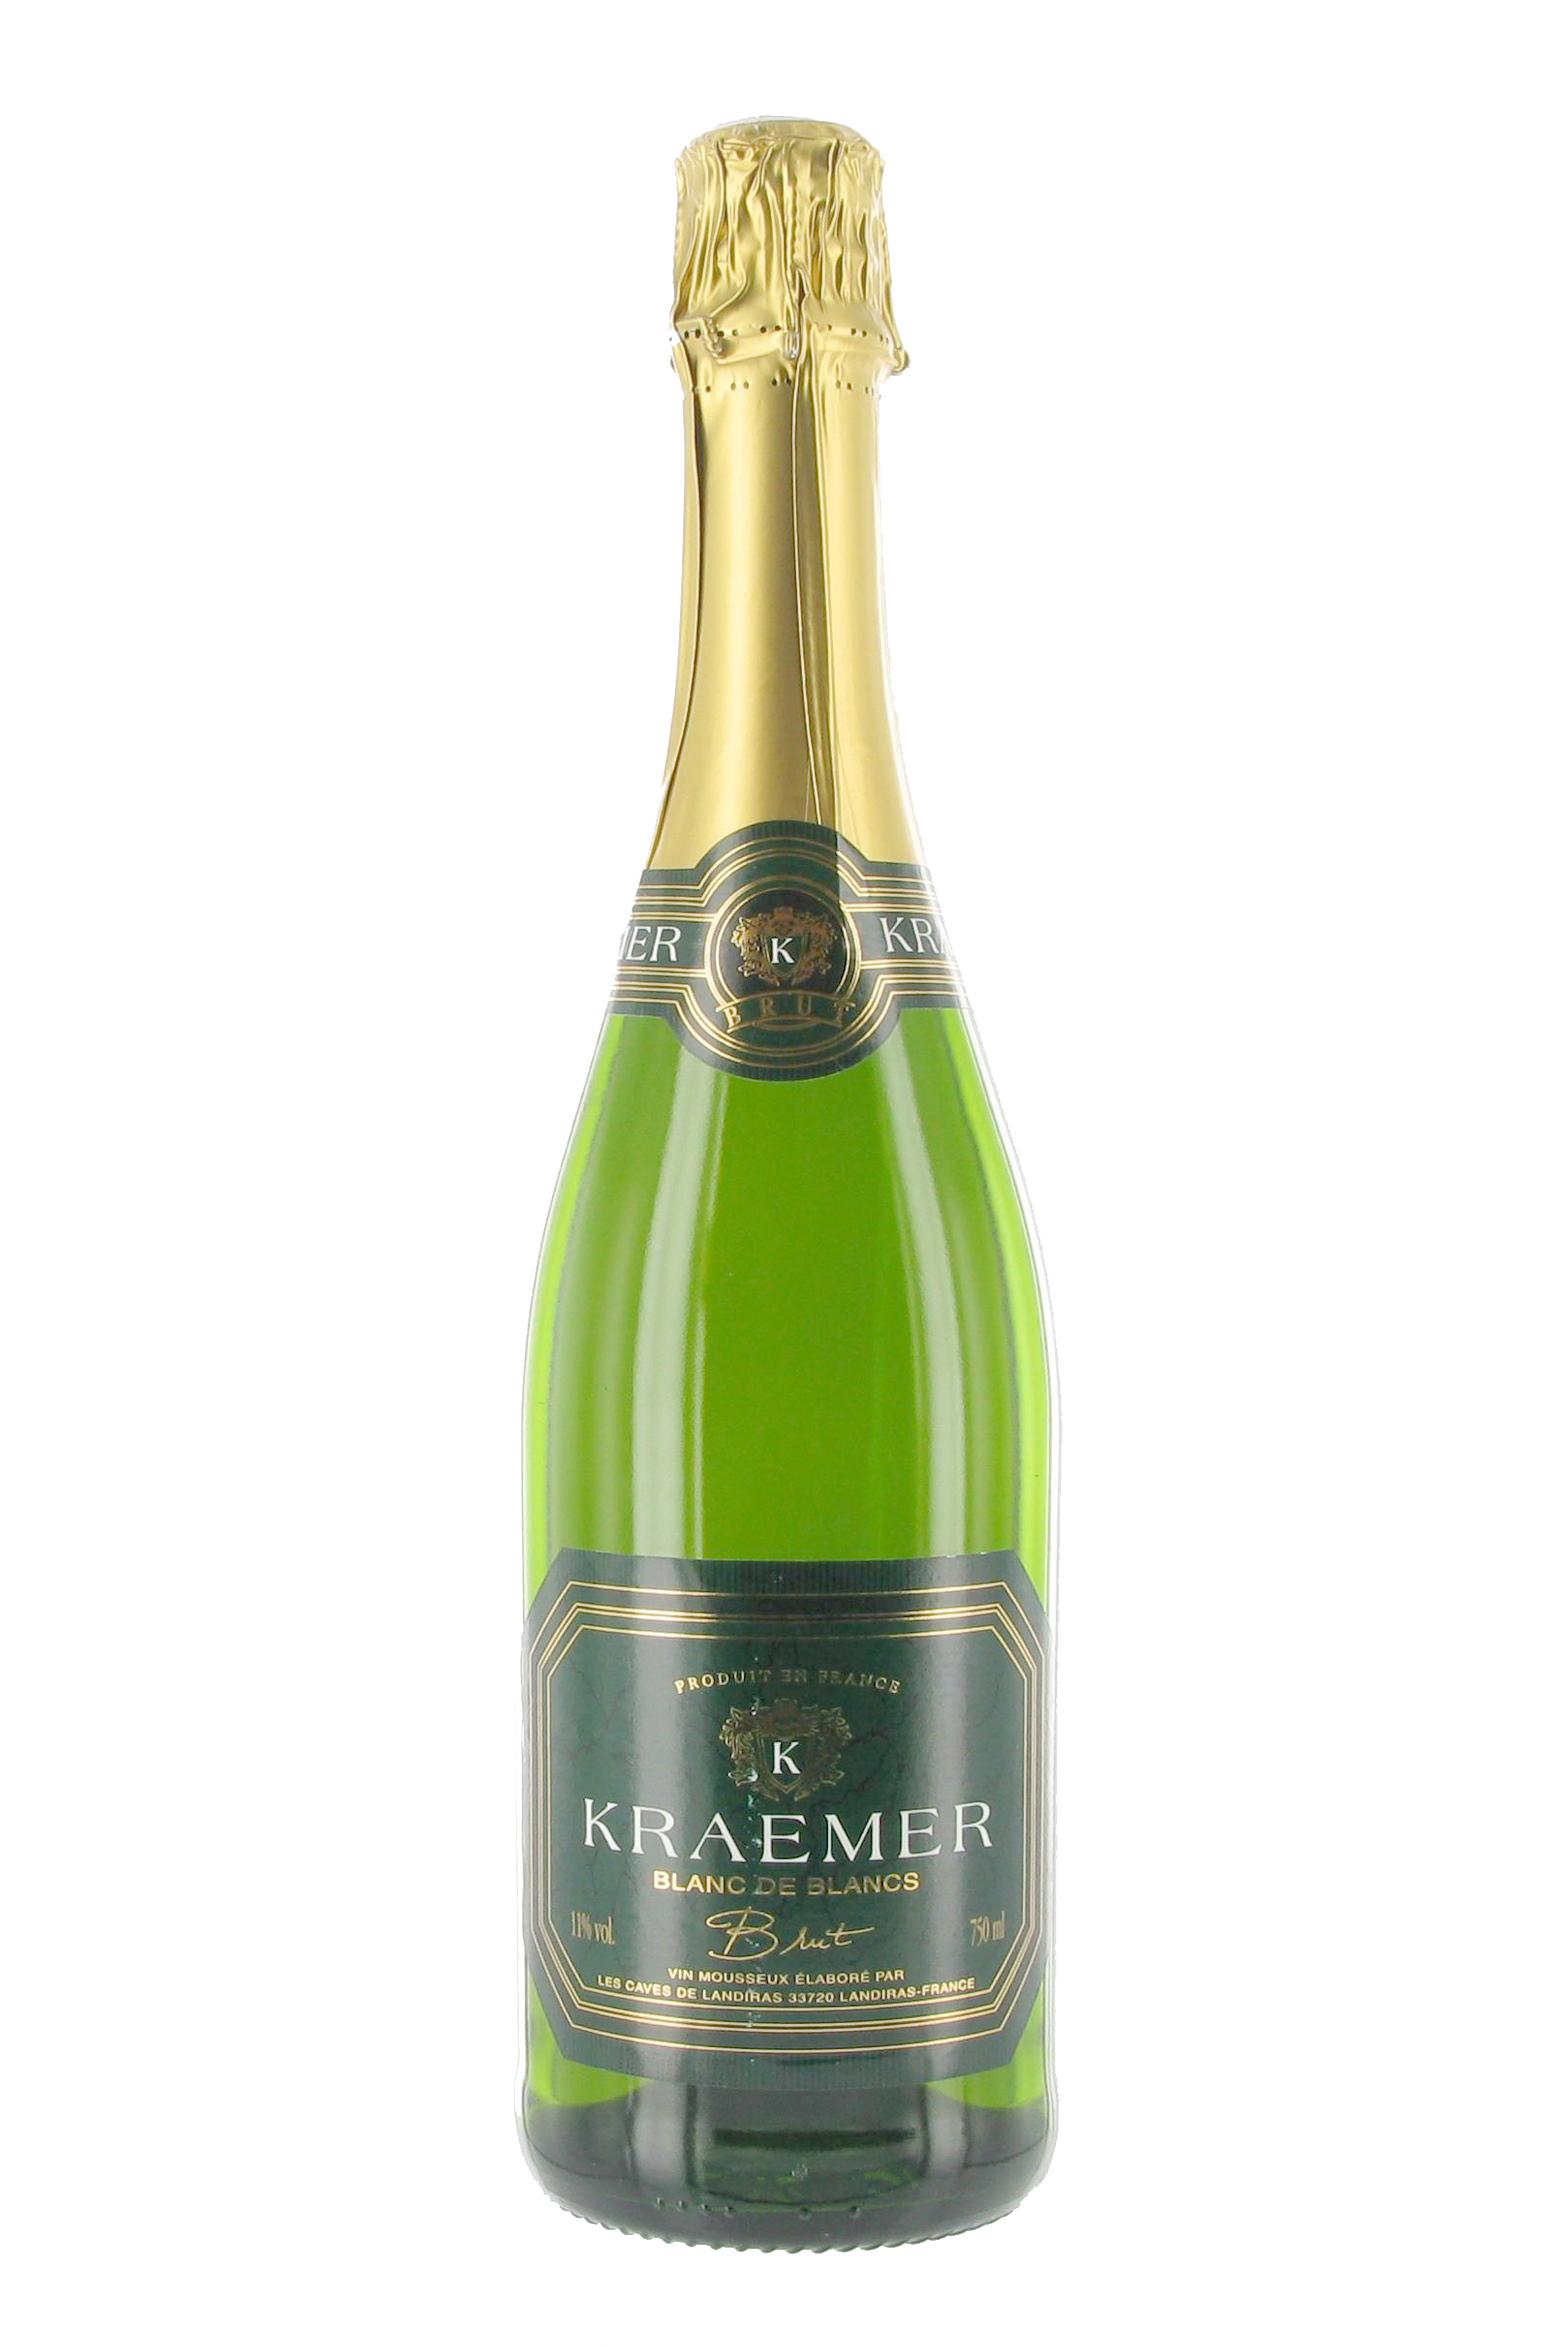 Sekt Kraemer Brut Blanc de Blancs Chardonnay